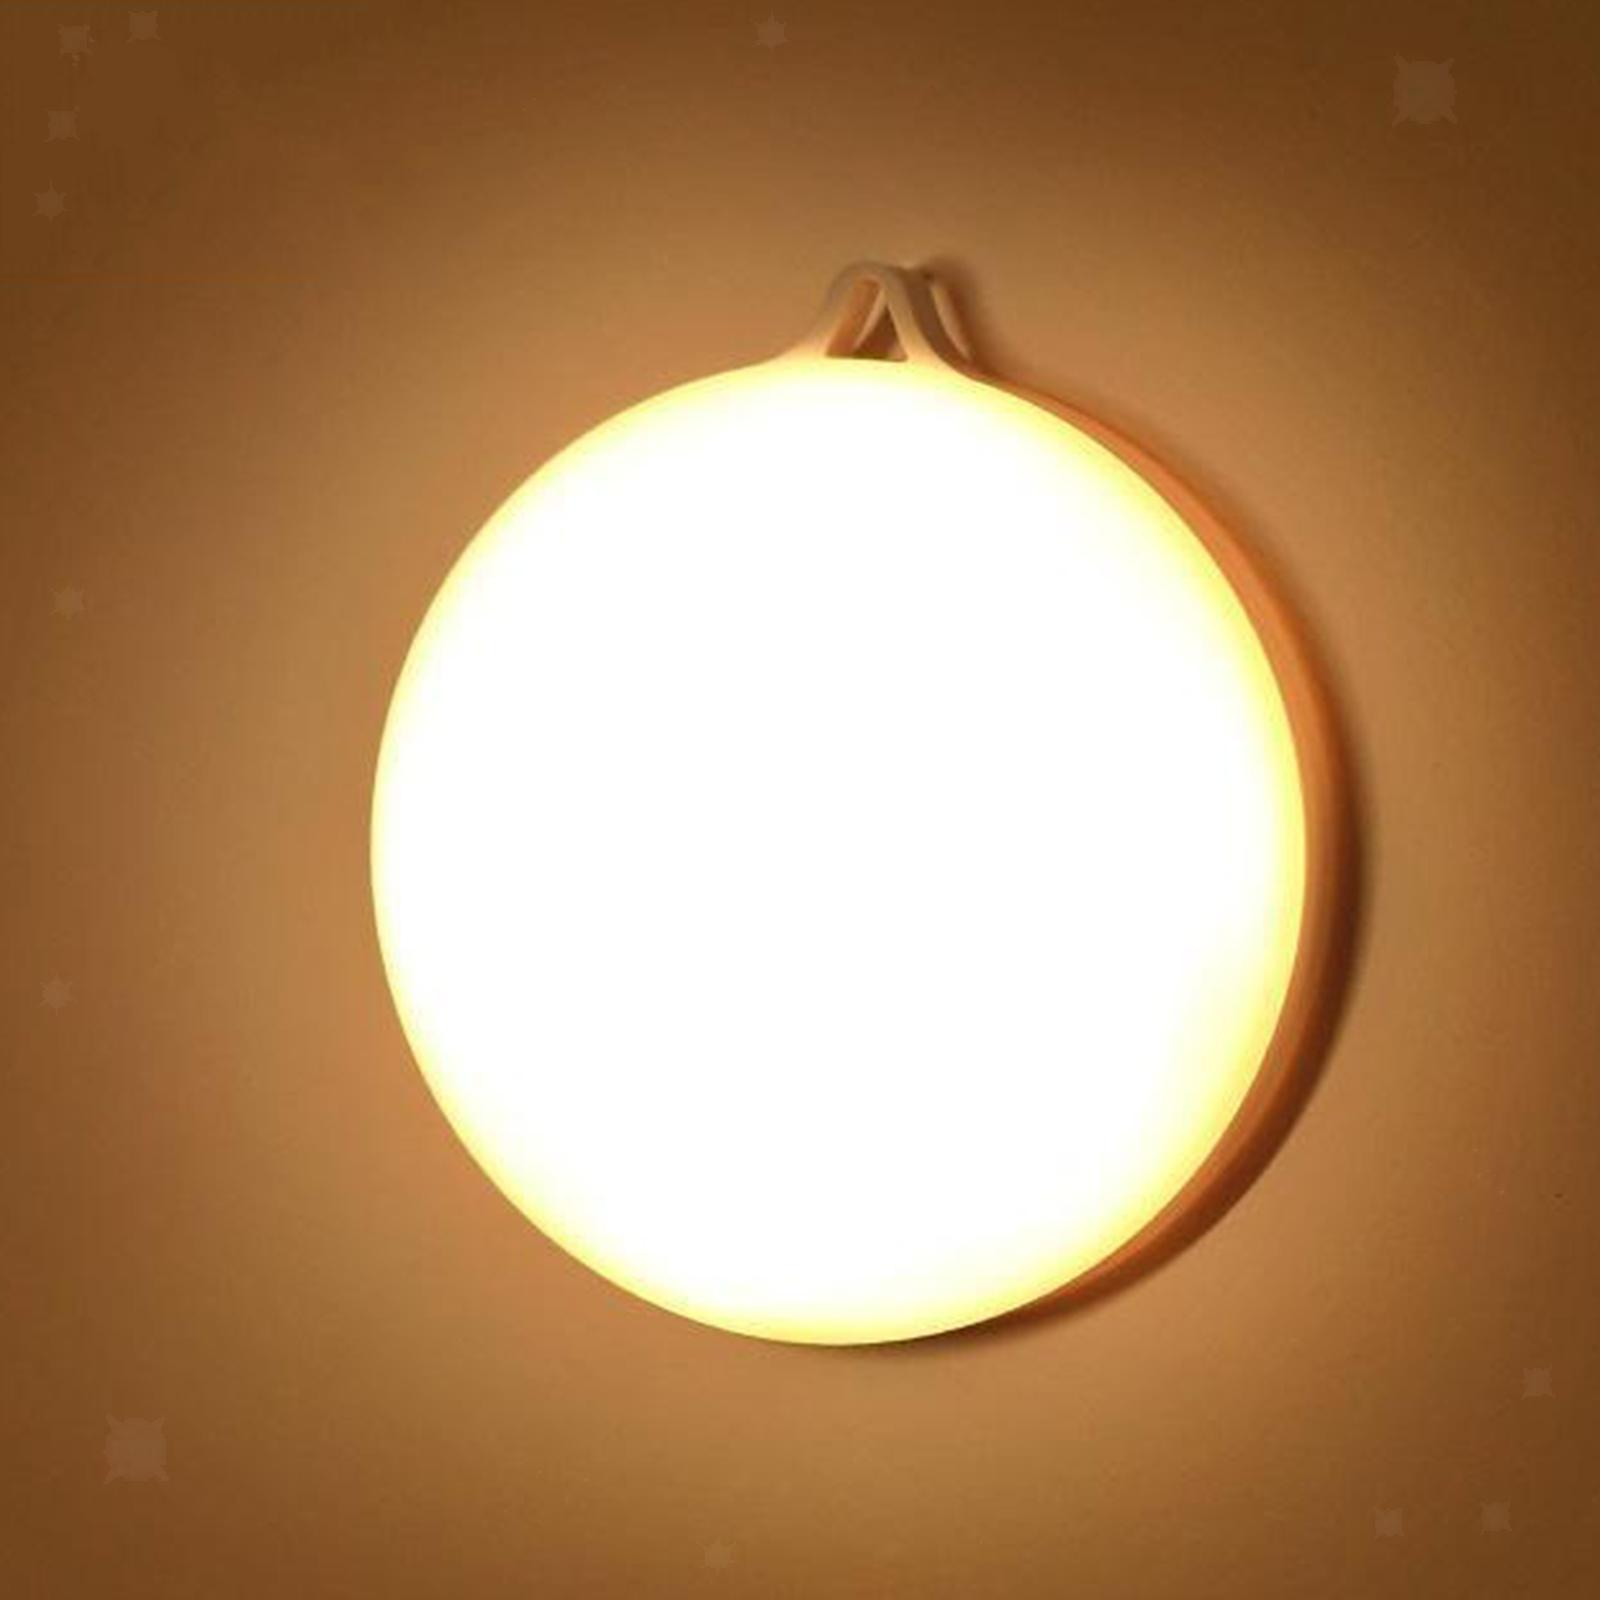 miniatura 9 - Luce notturna a LED per camera da letto ricaricabile USB per Hotel con sensore